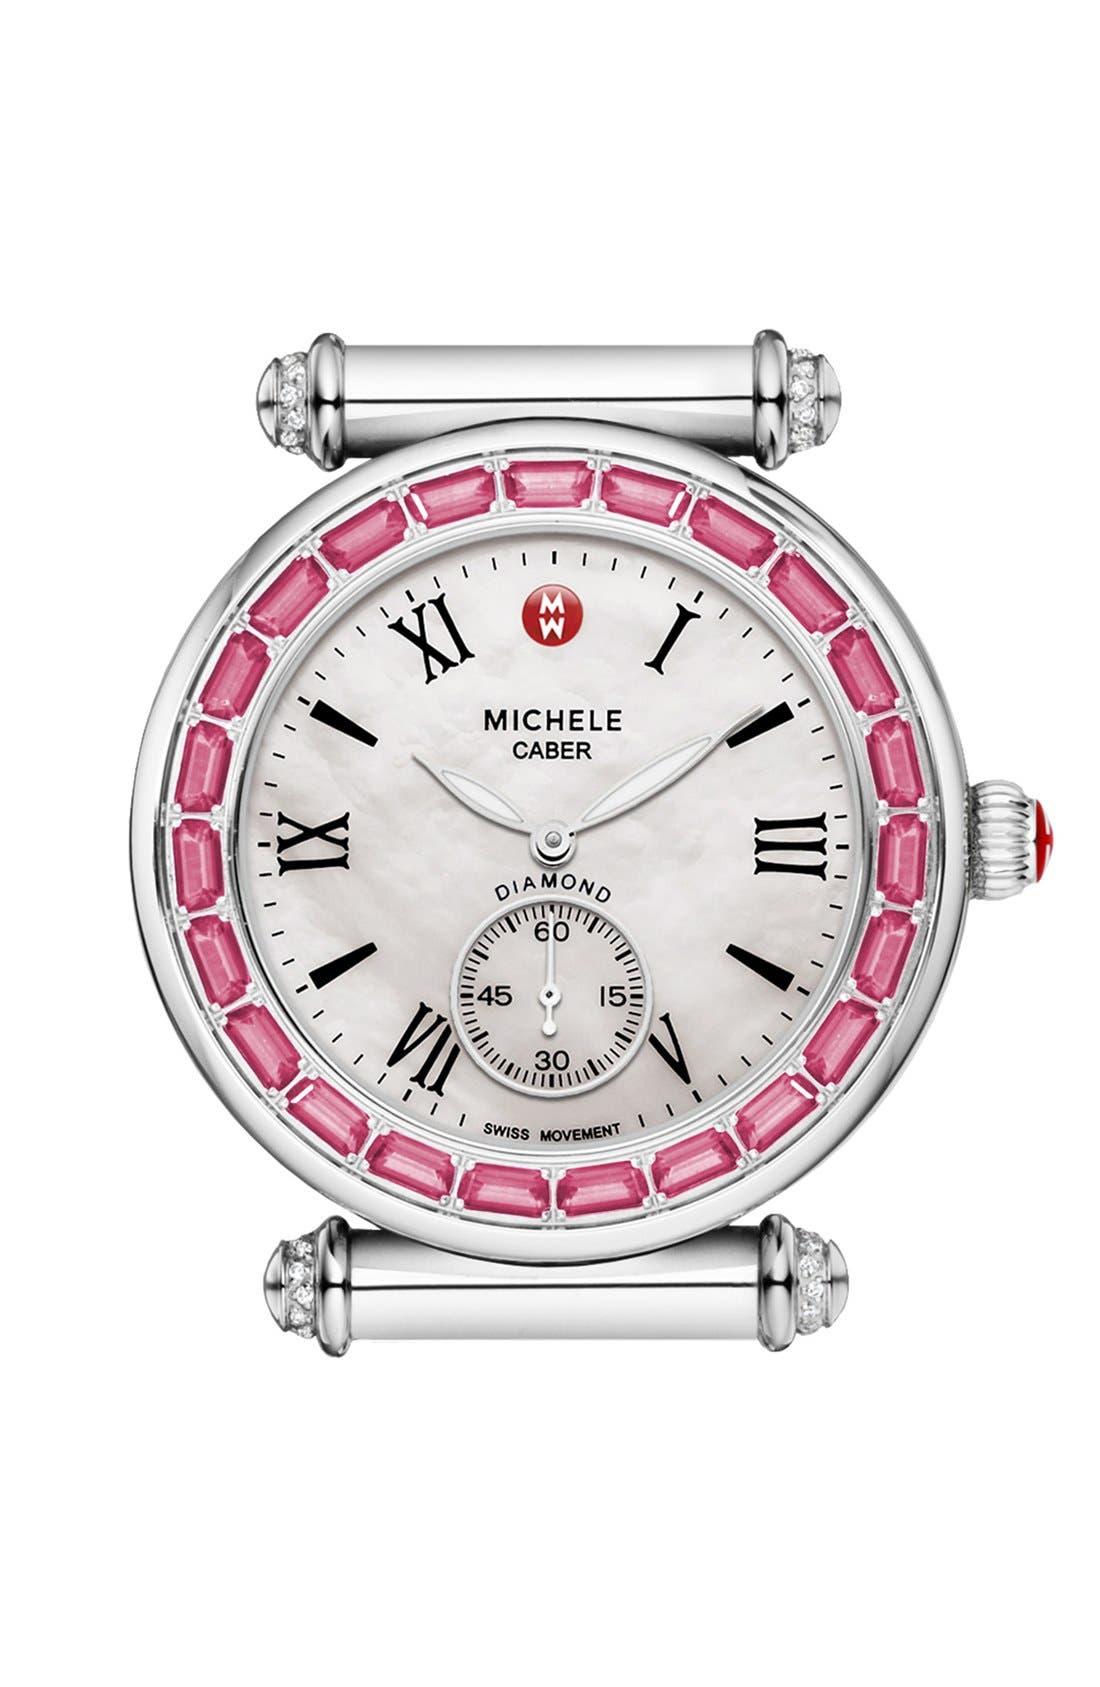 Main Image - MICHELE 'Caber' Diamond Watch Case, 37mm